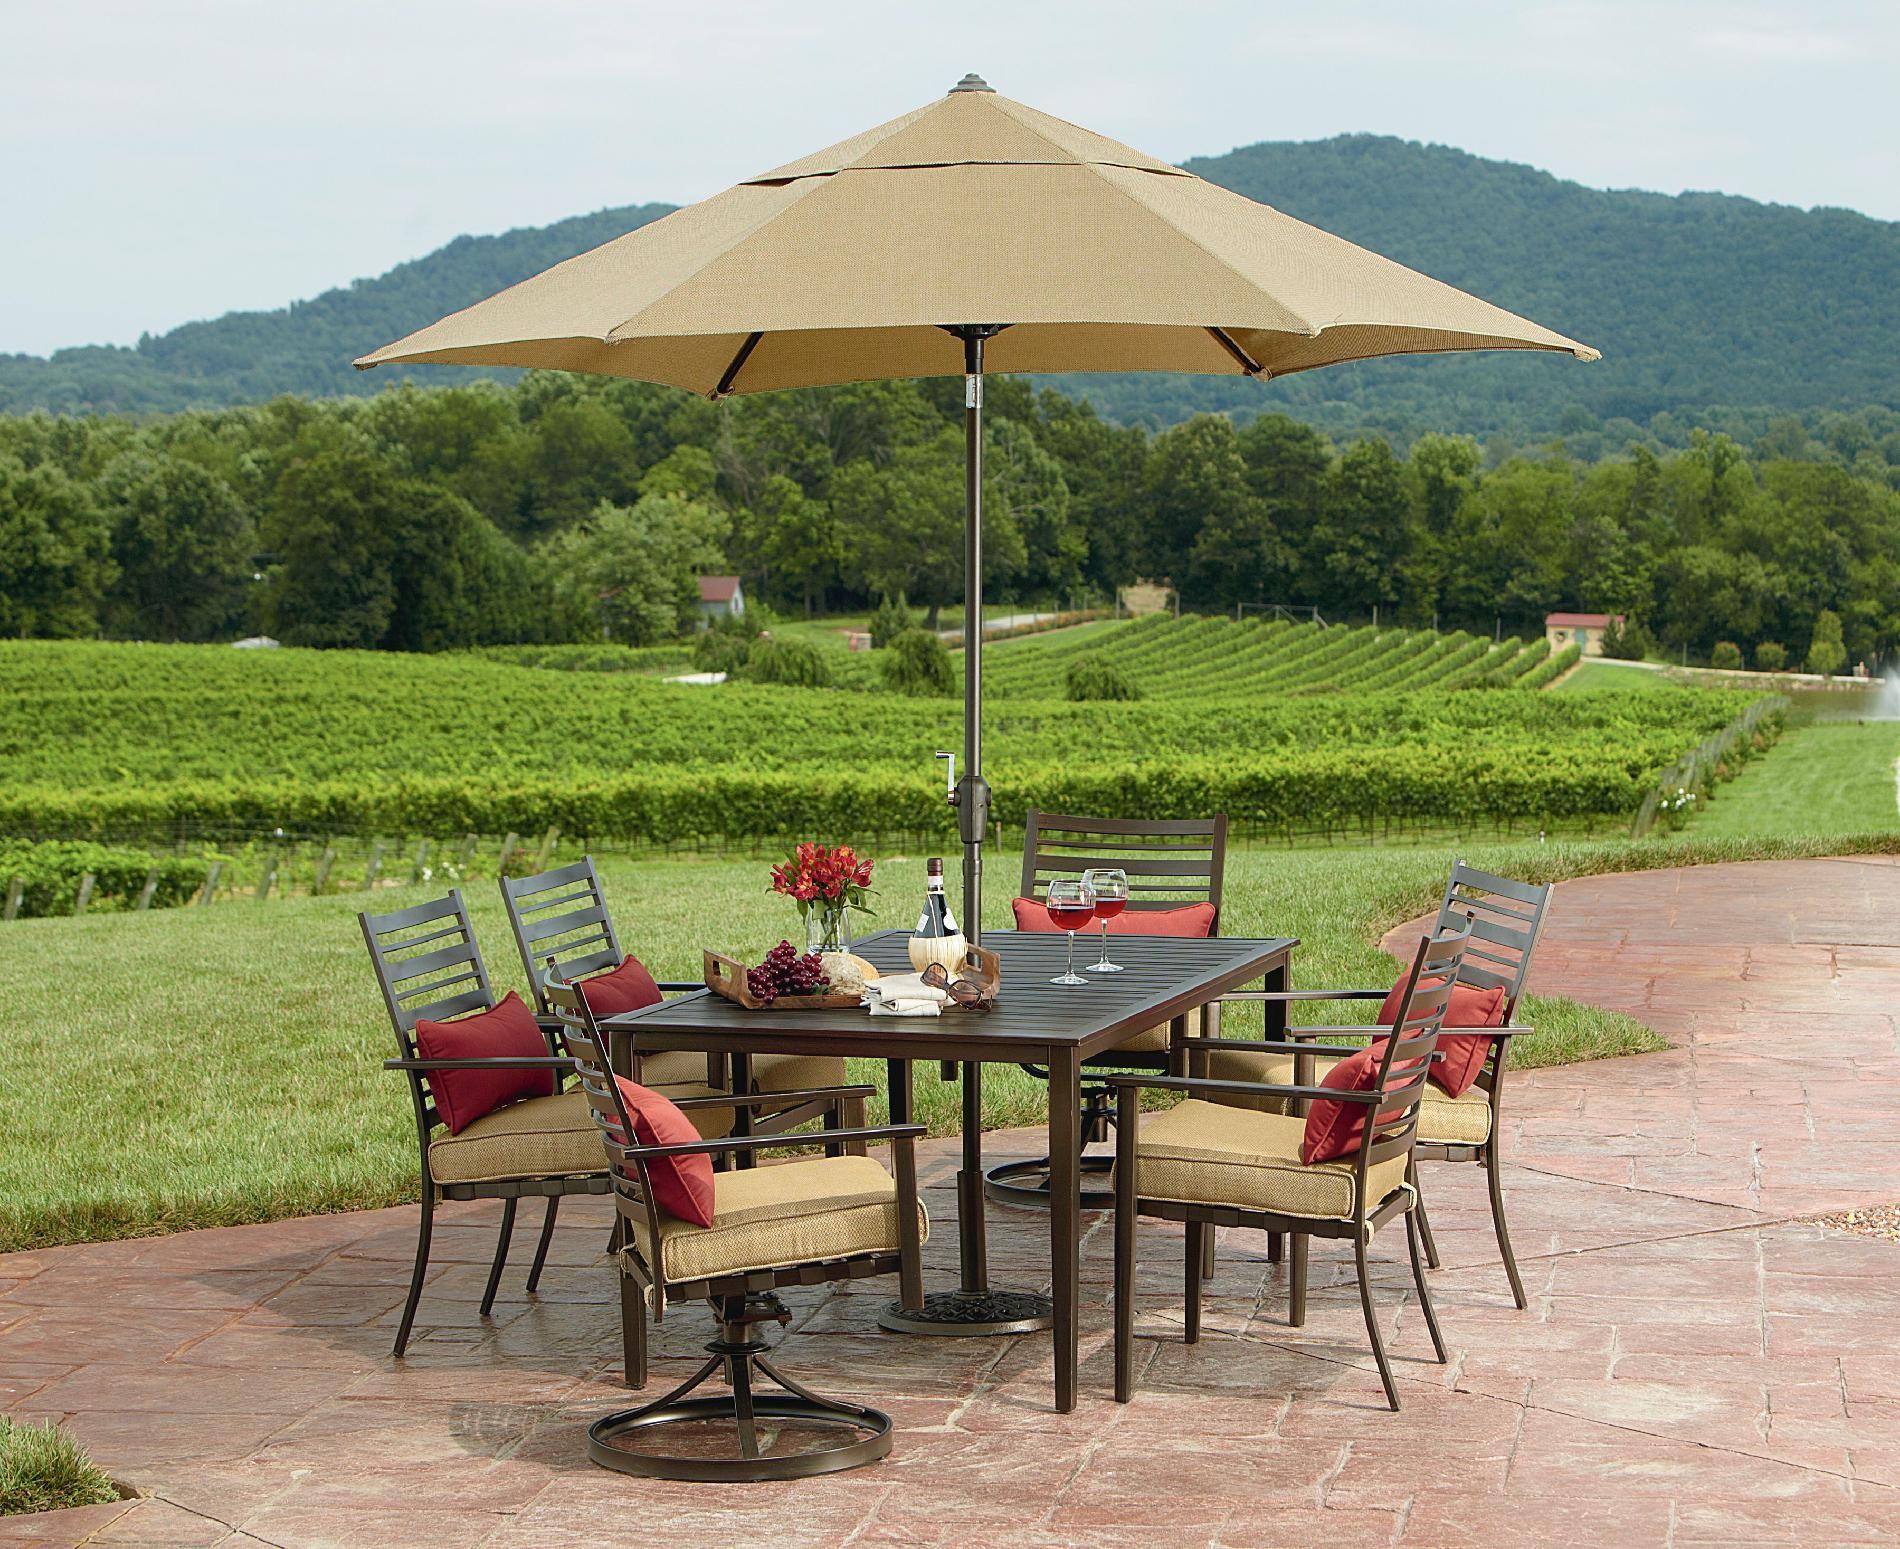 Grand Resort Gardiner 7 Piece Slat Dining Set - Outdoor